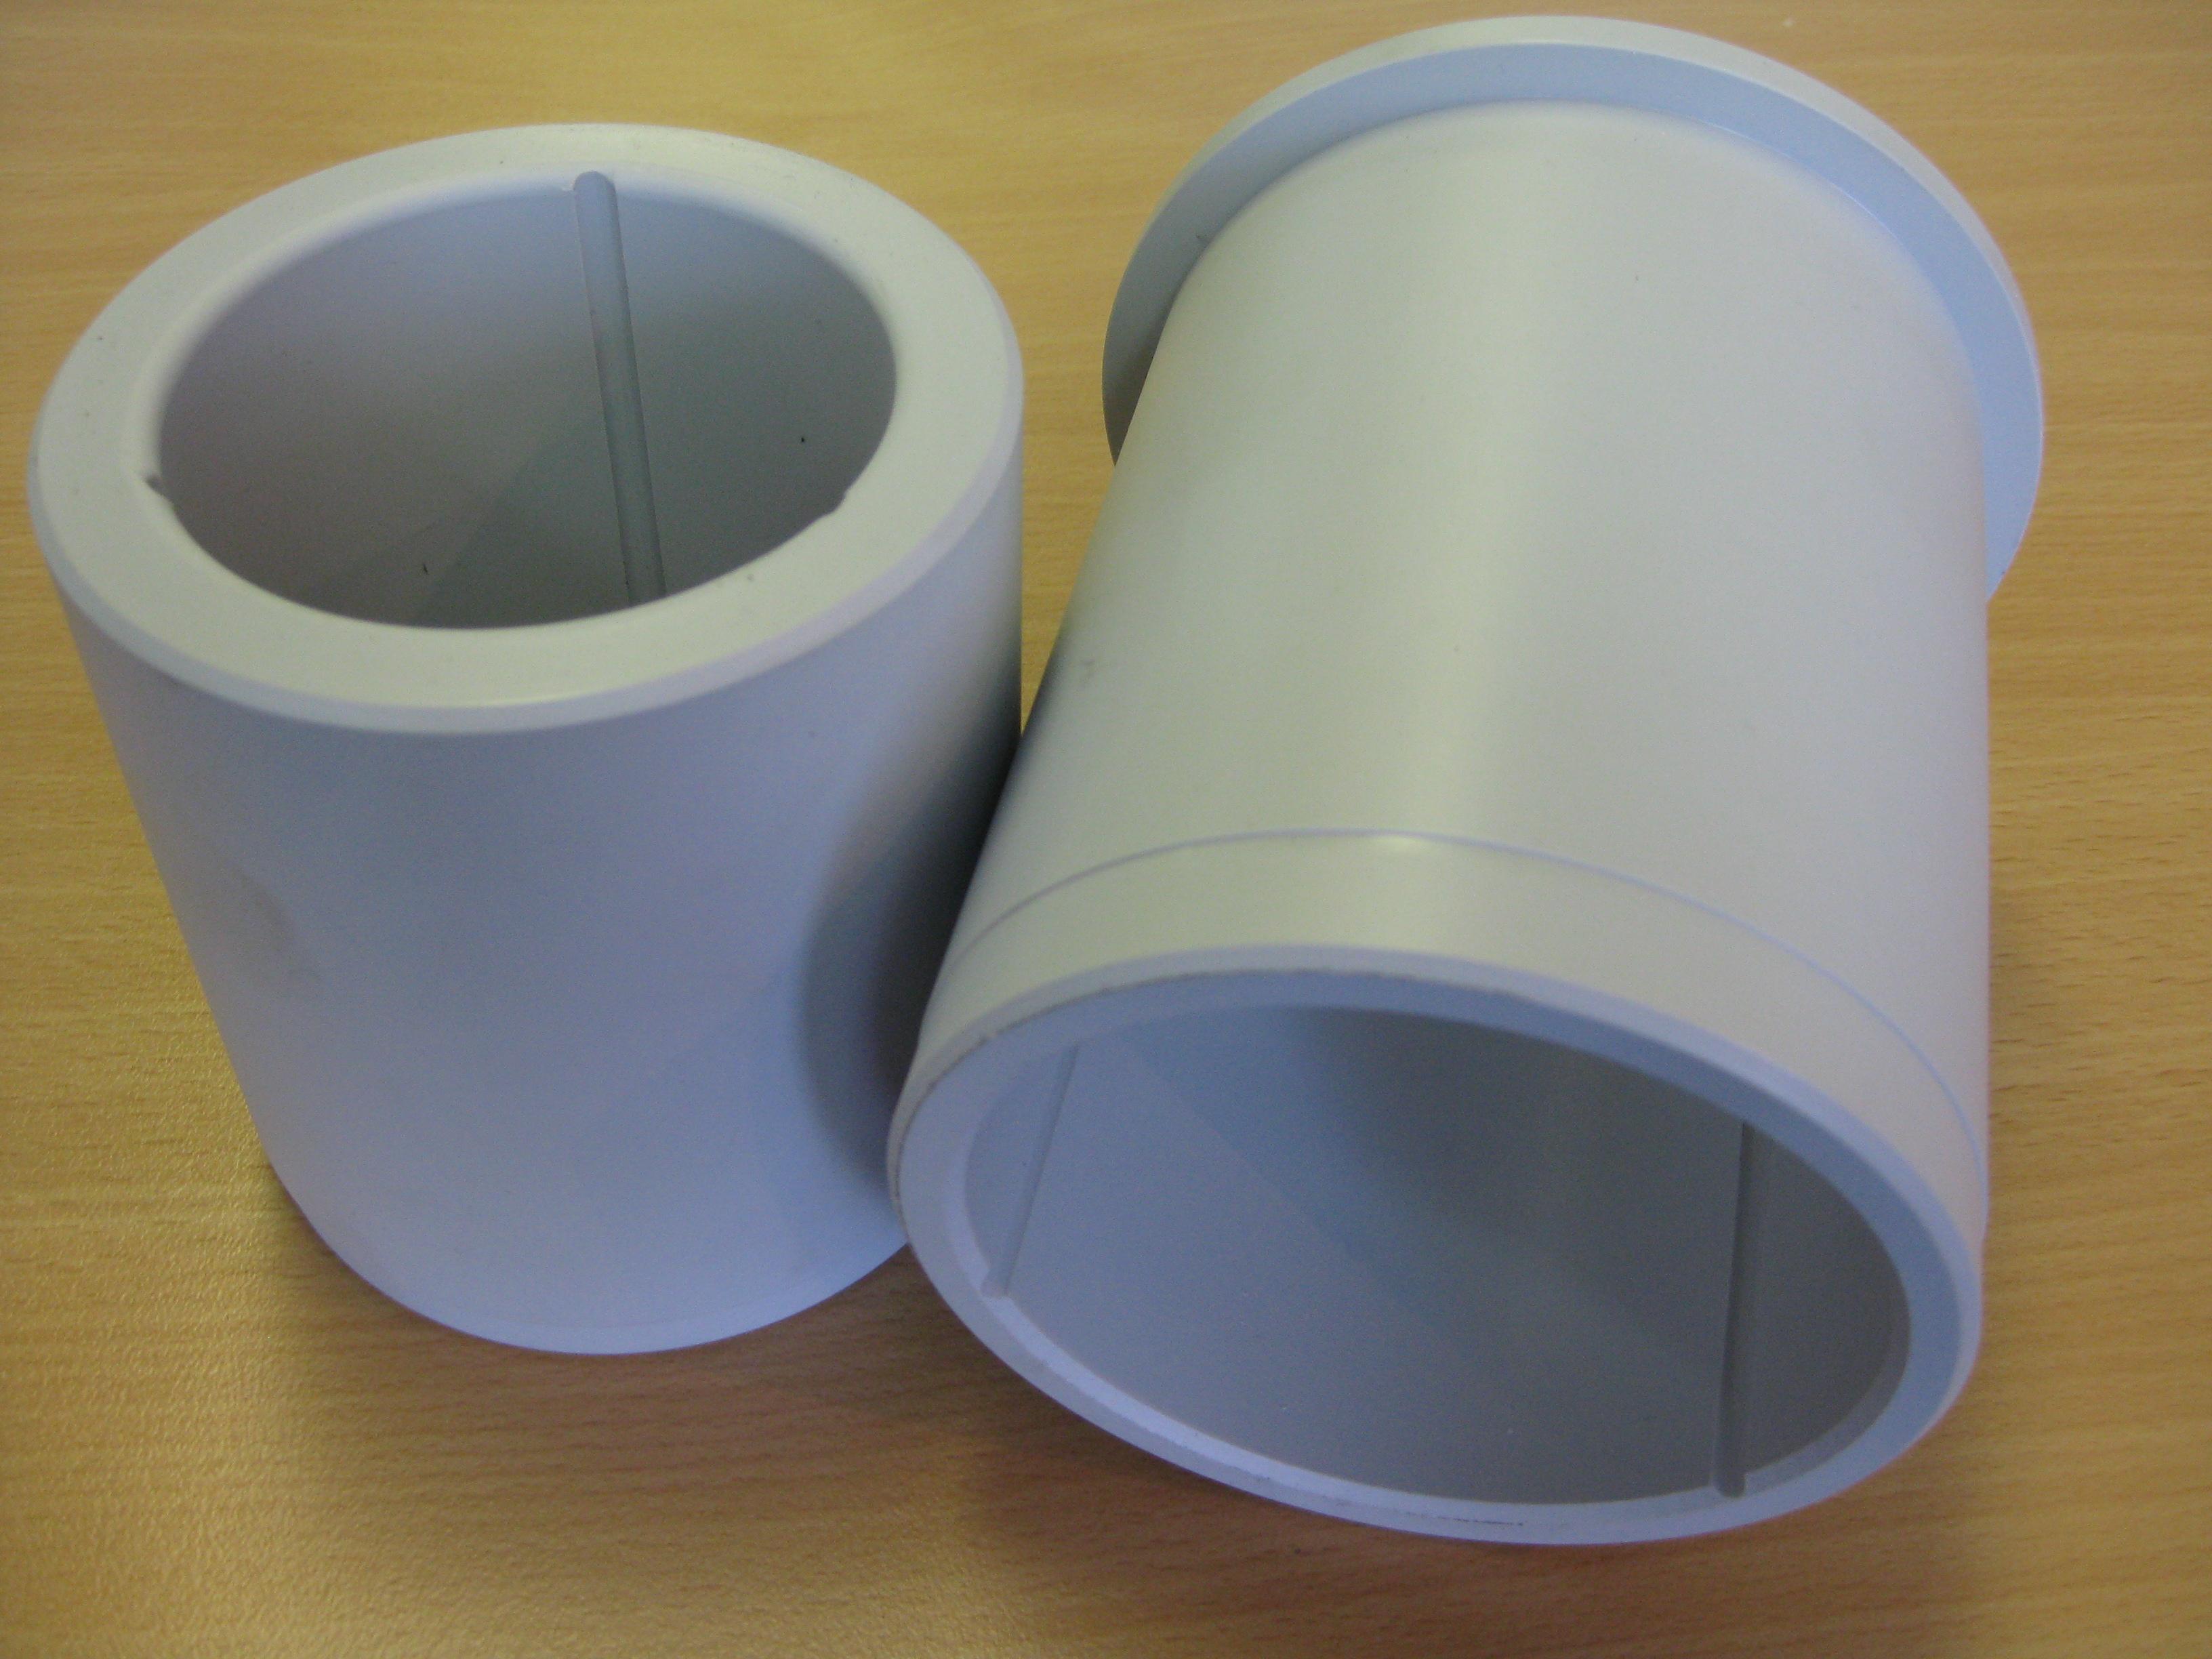 Transport Solutions In Plastic